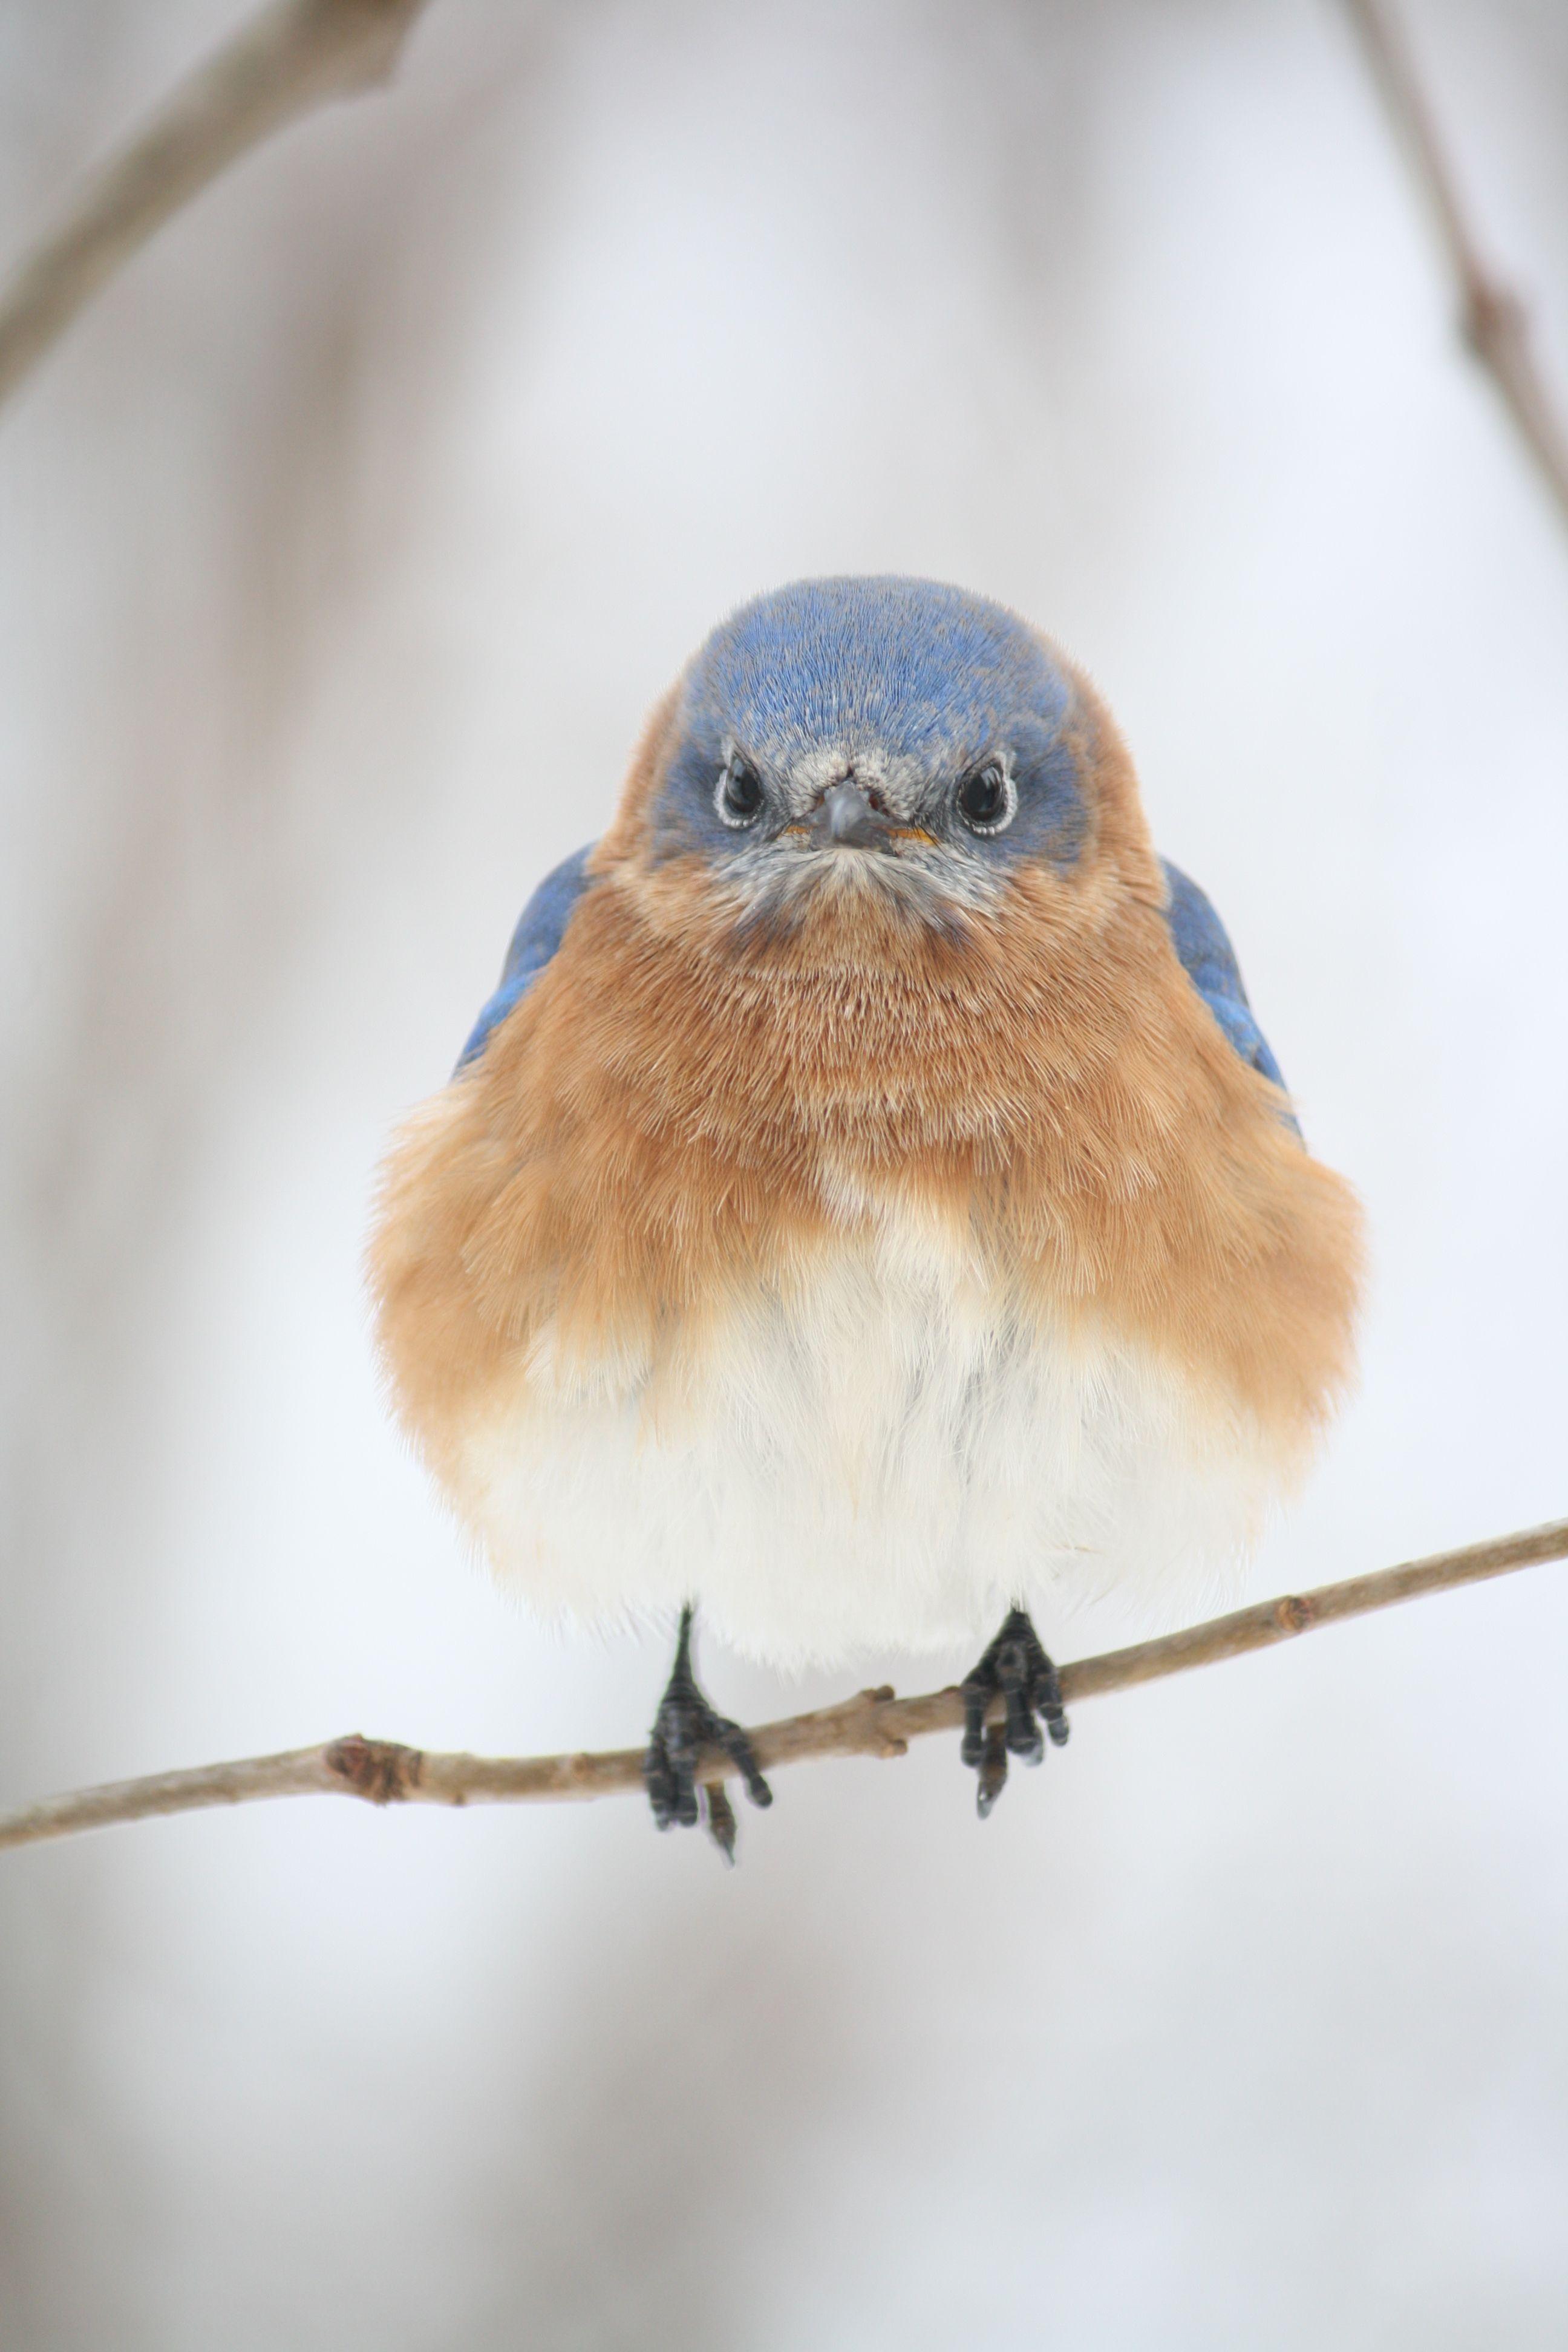 bluebird looks like he has a case of the grumps birds